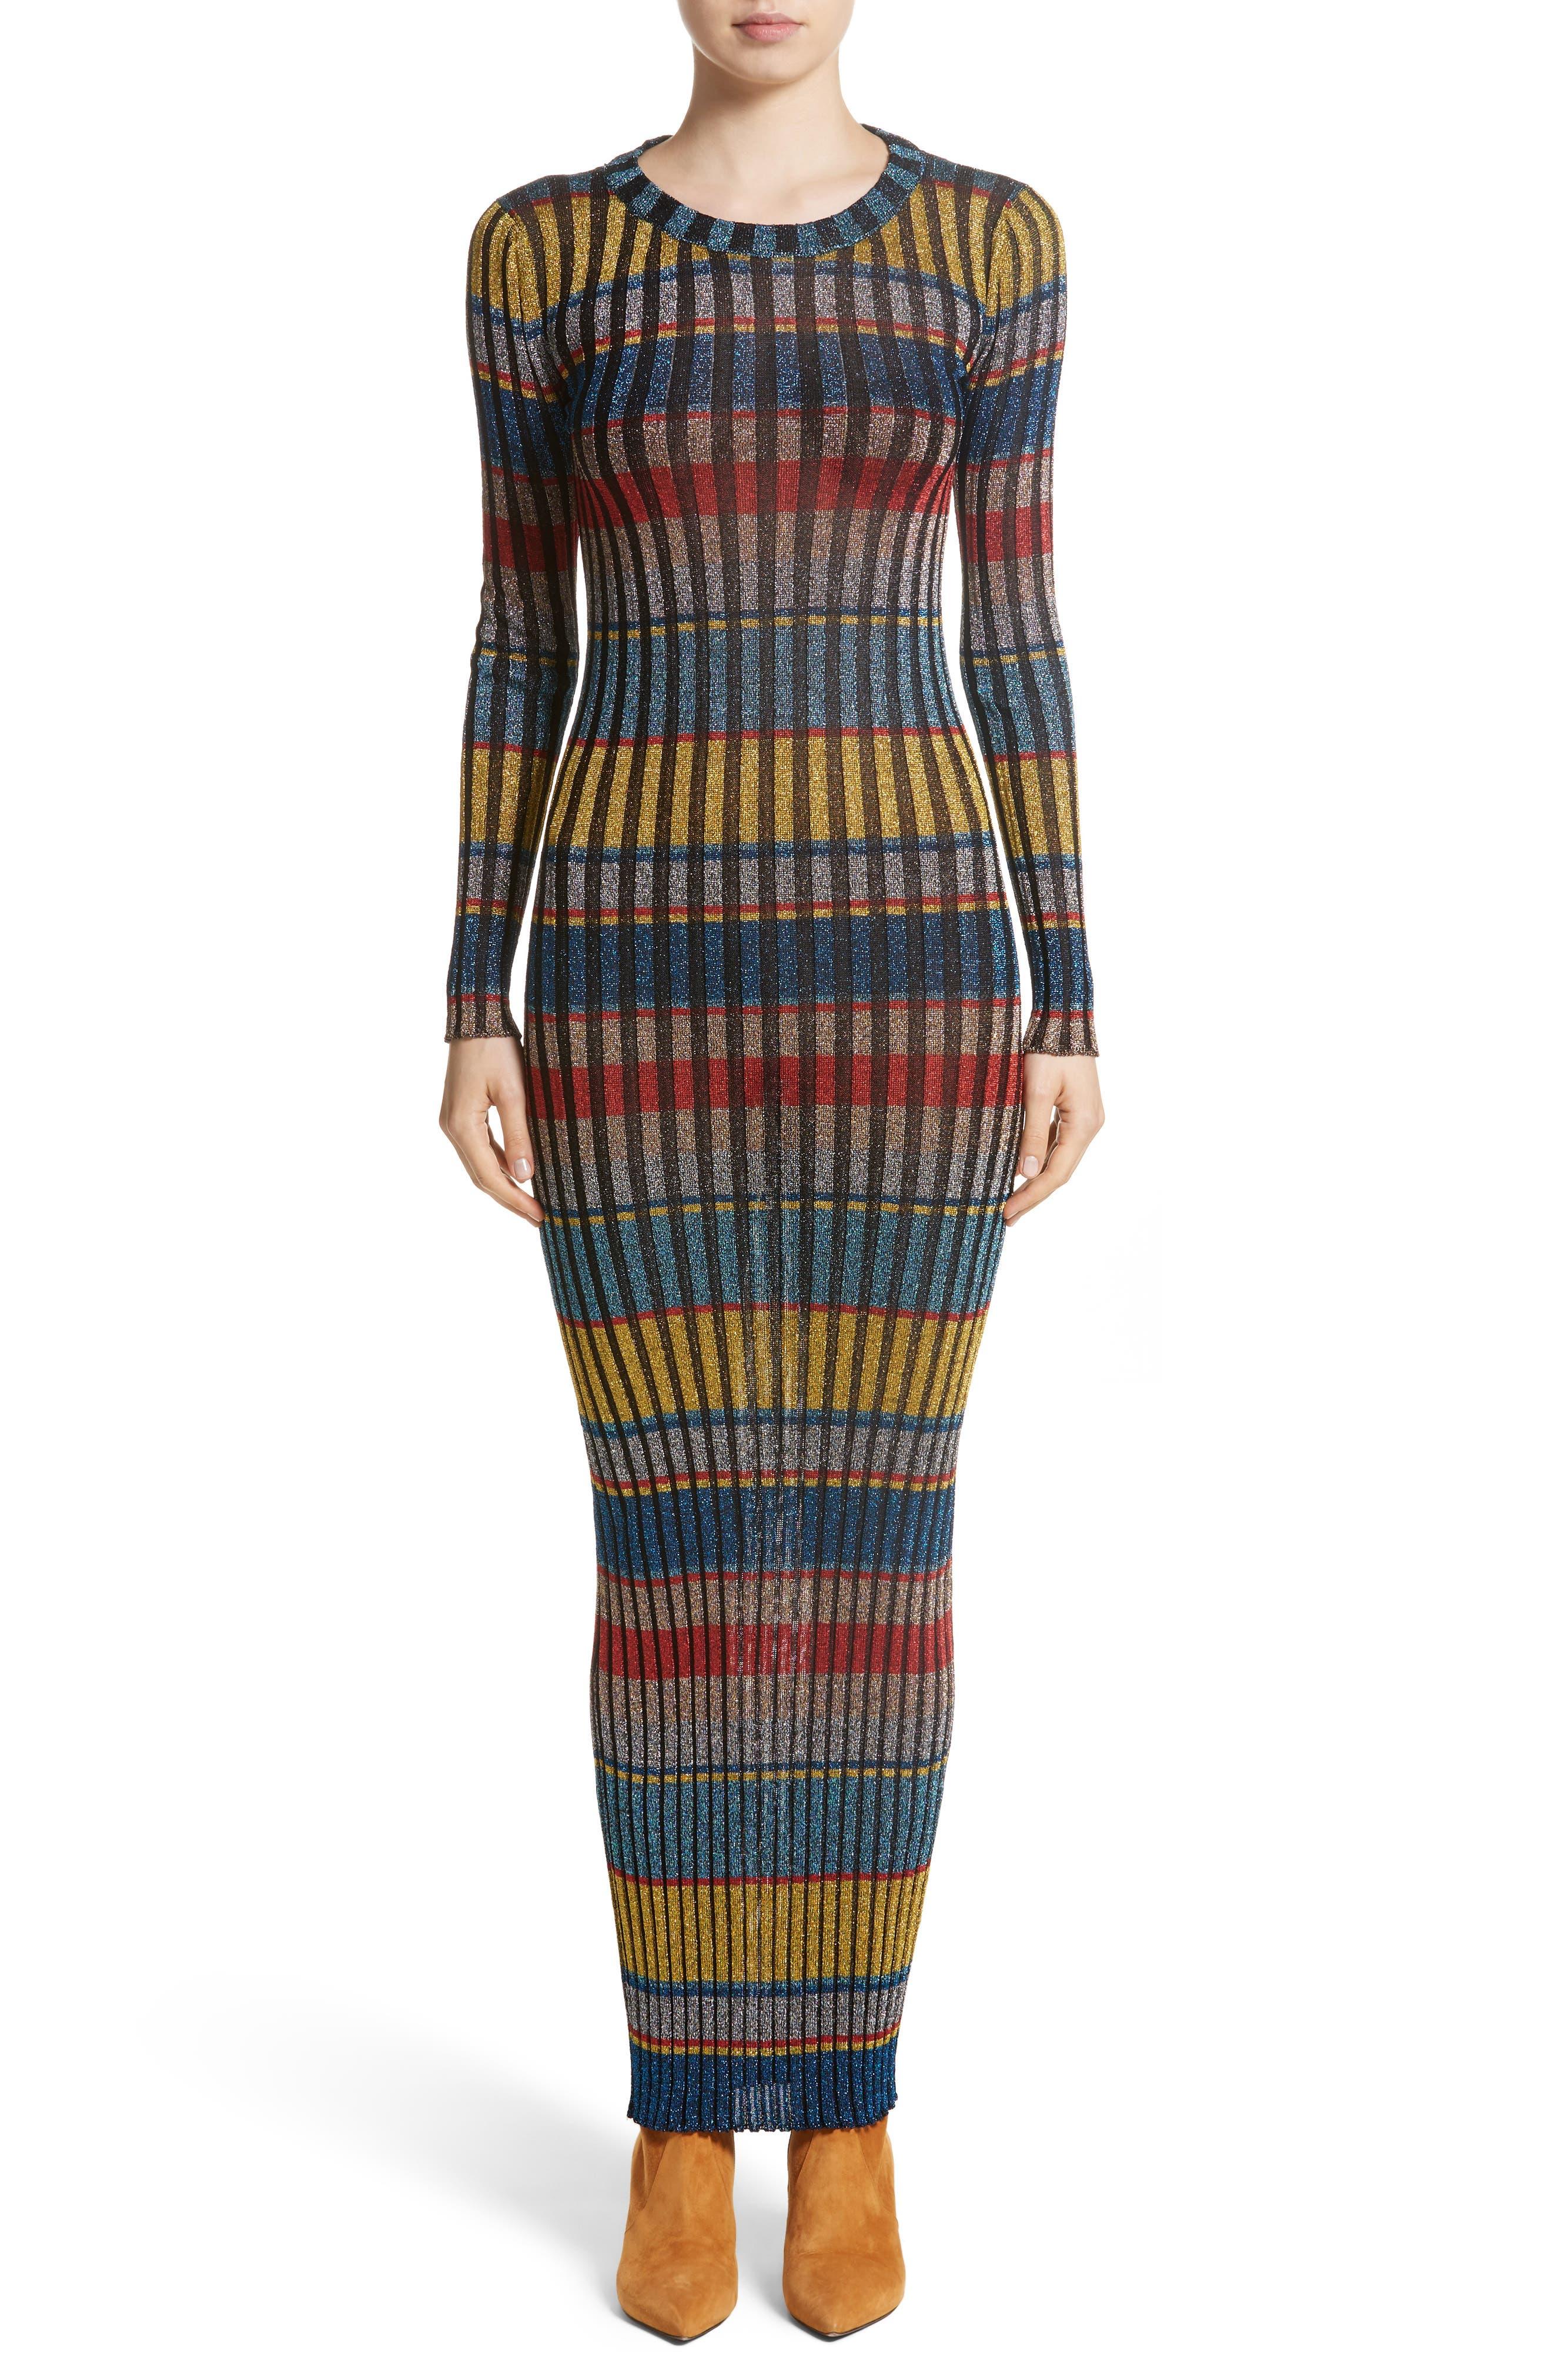 Alternate Image 1 Selected - Missoni Metallic Stripe Knit Maxi Dress